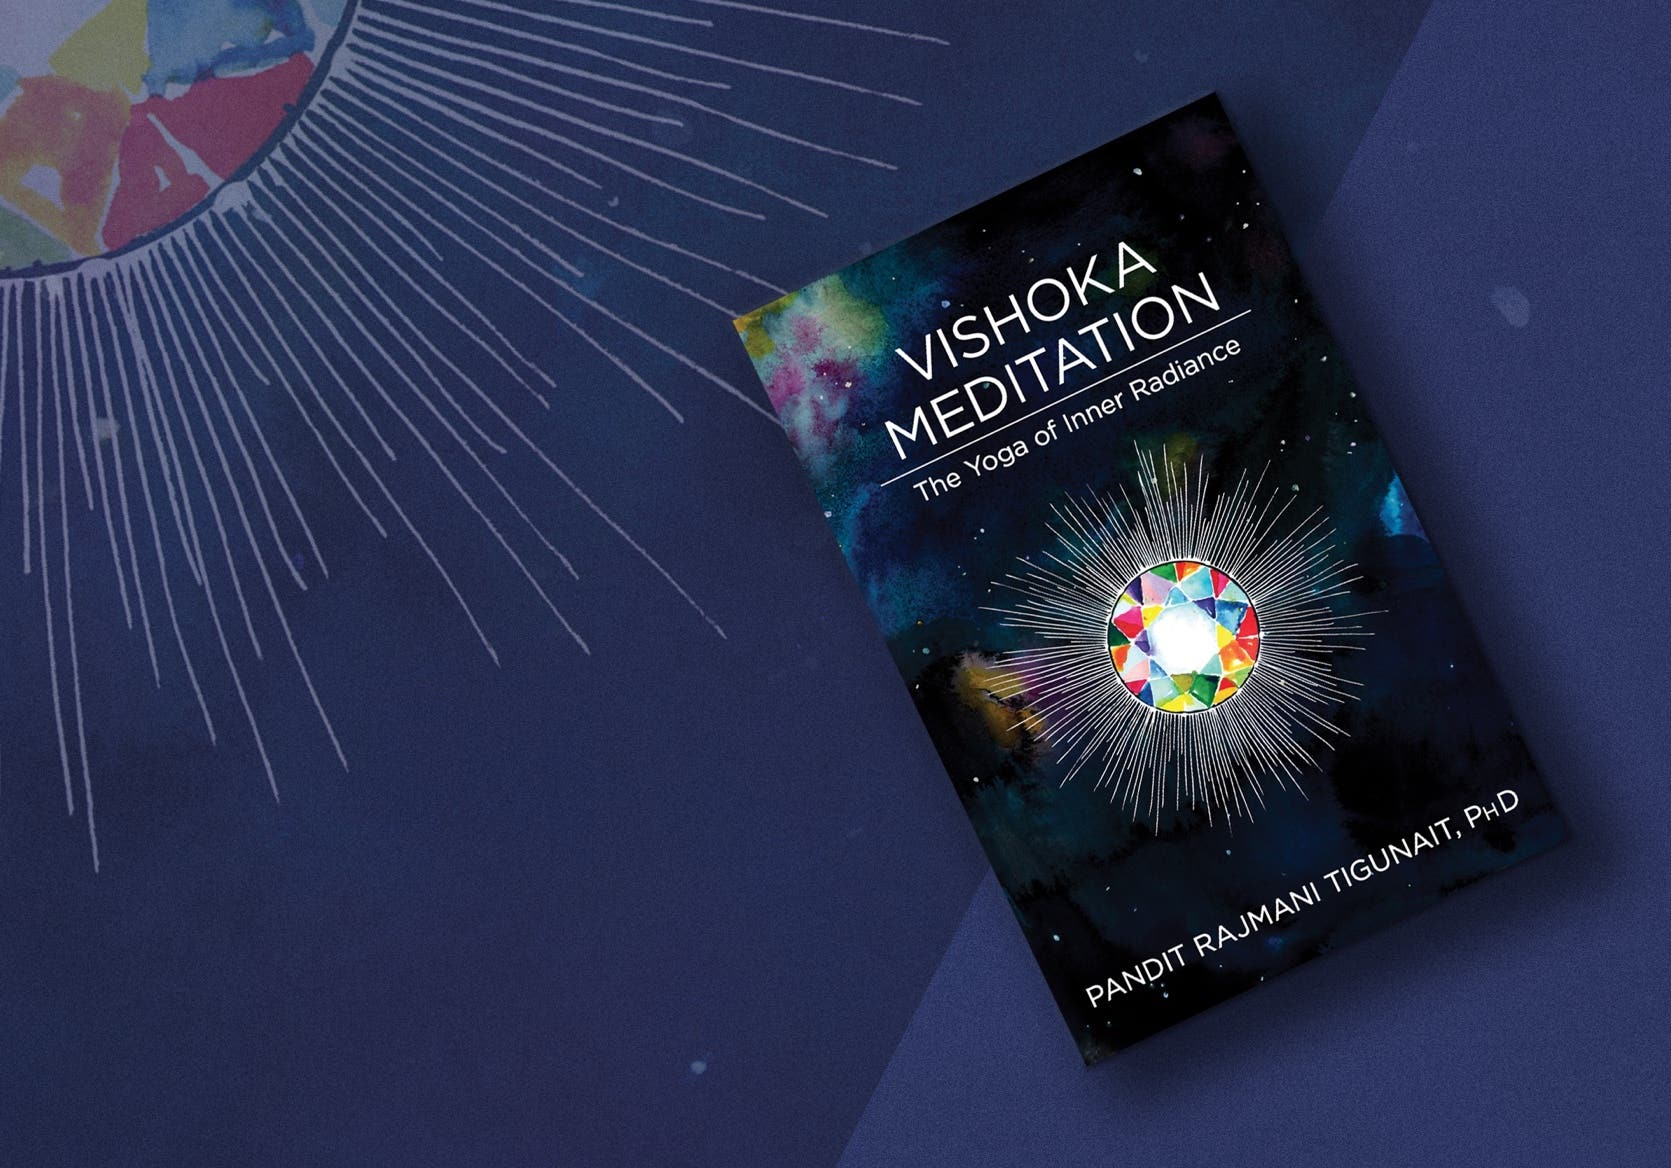 Vishoka Meditation® Digital Companion - The Yoga of Inner Radiance